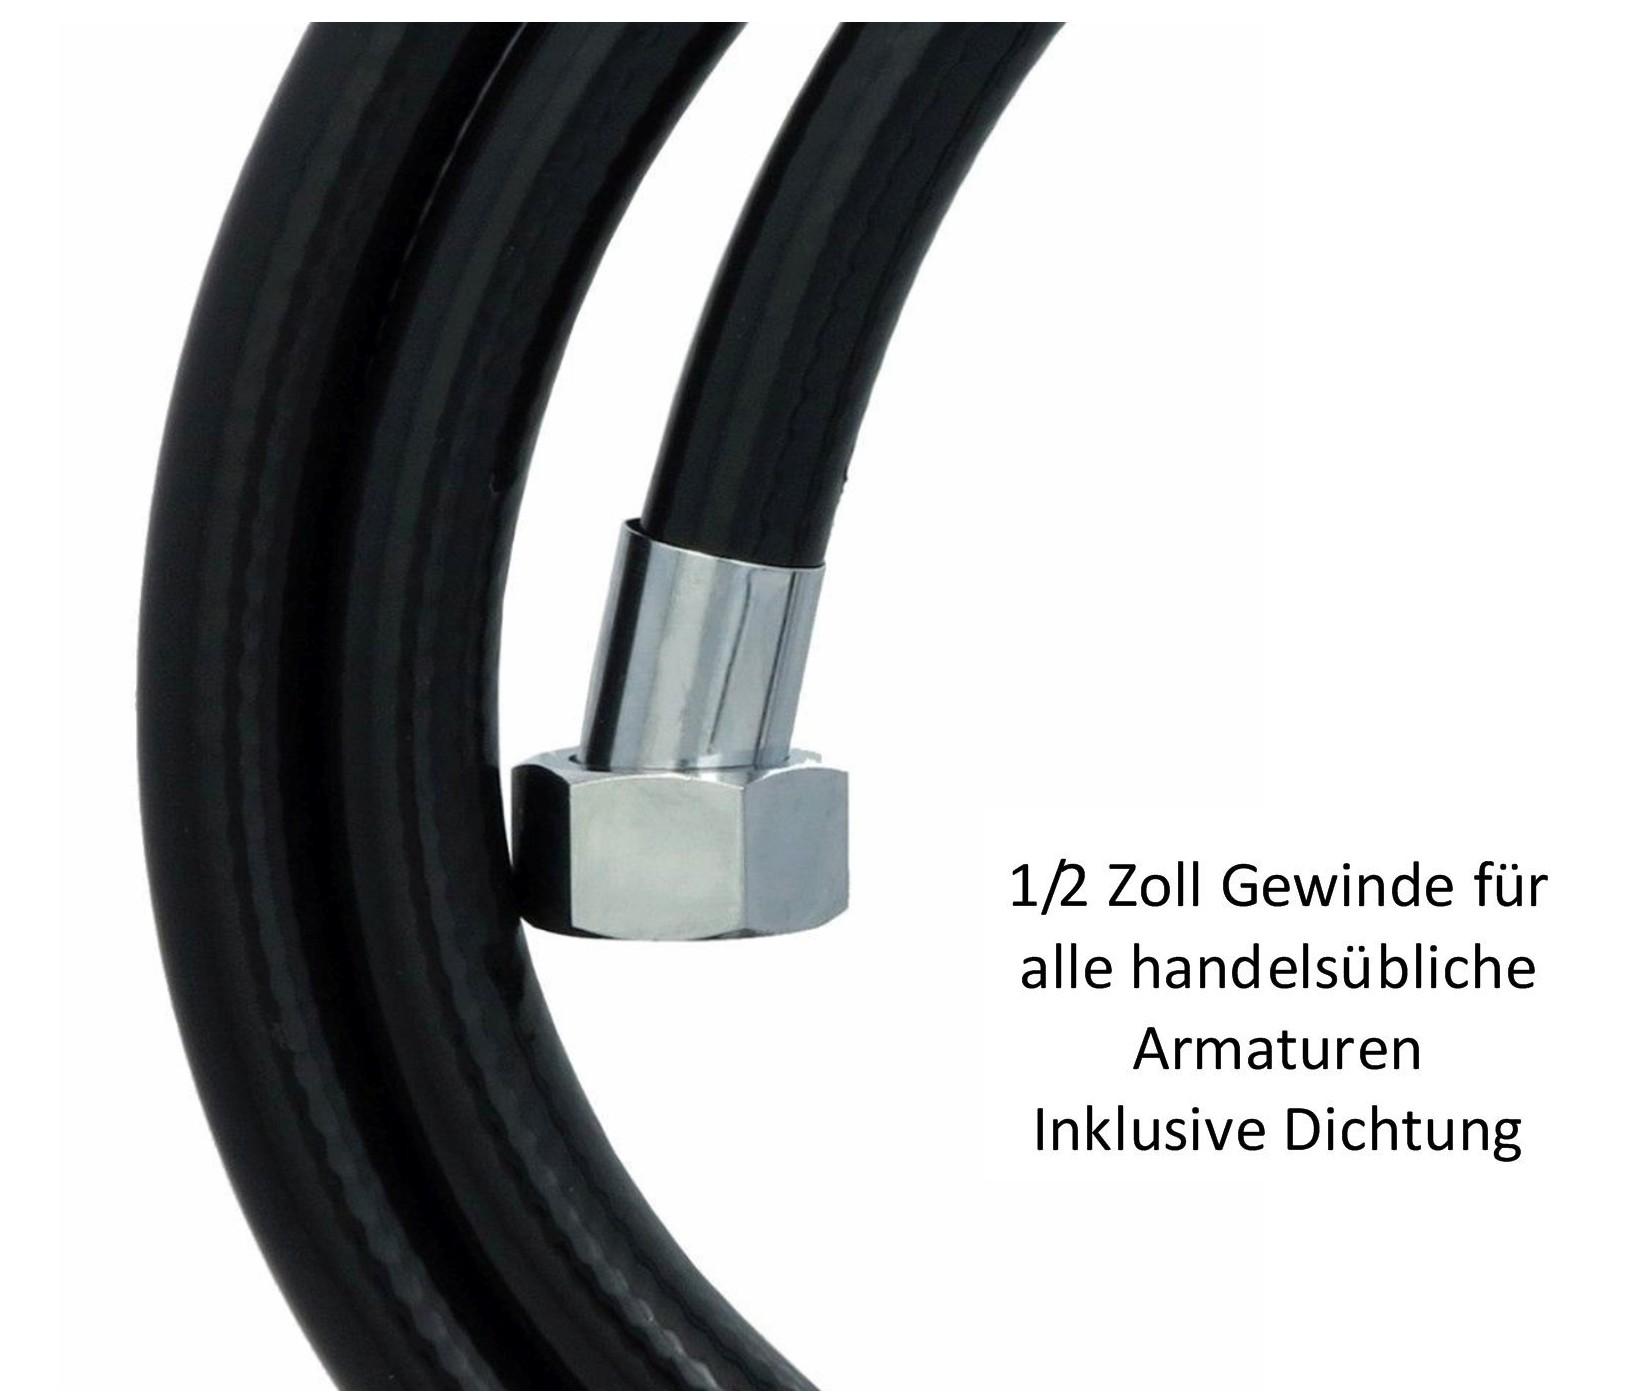 brauseschlauch 150cm duschschlauch pvc verdrehschutz 1 2 zoll schlauch schwarz ebay. Black Bedroom Furniture Sets. Home Design Ideas